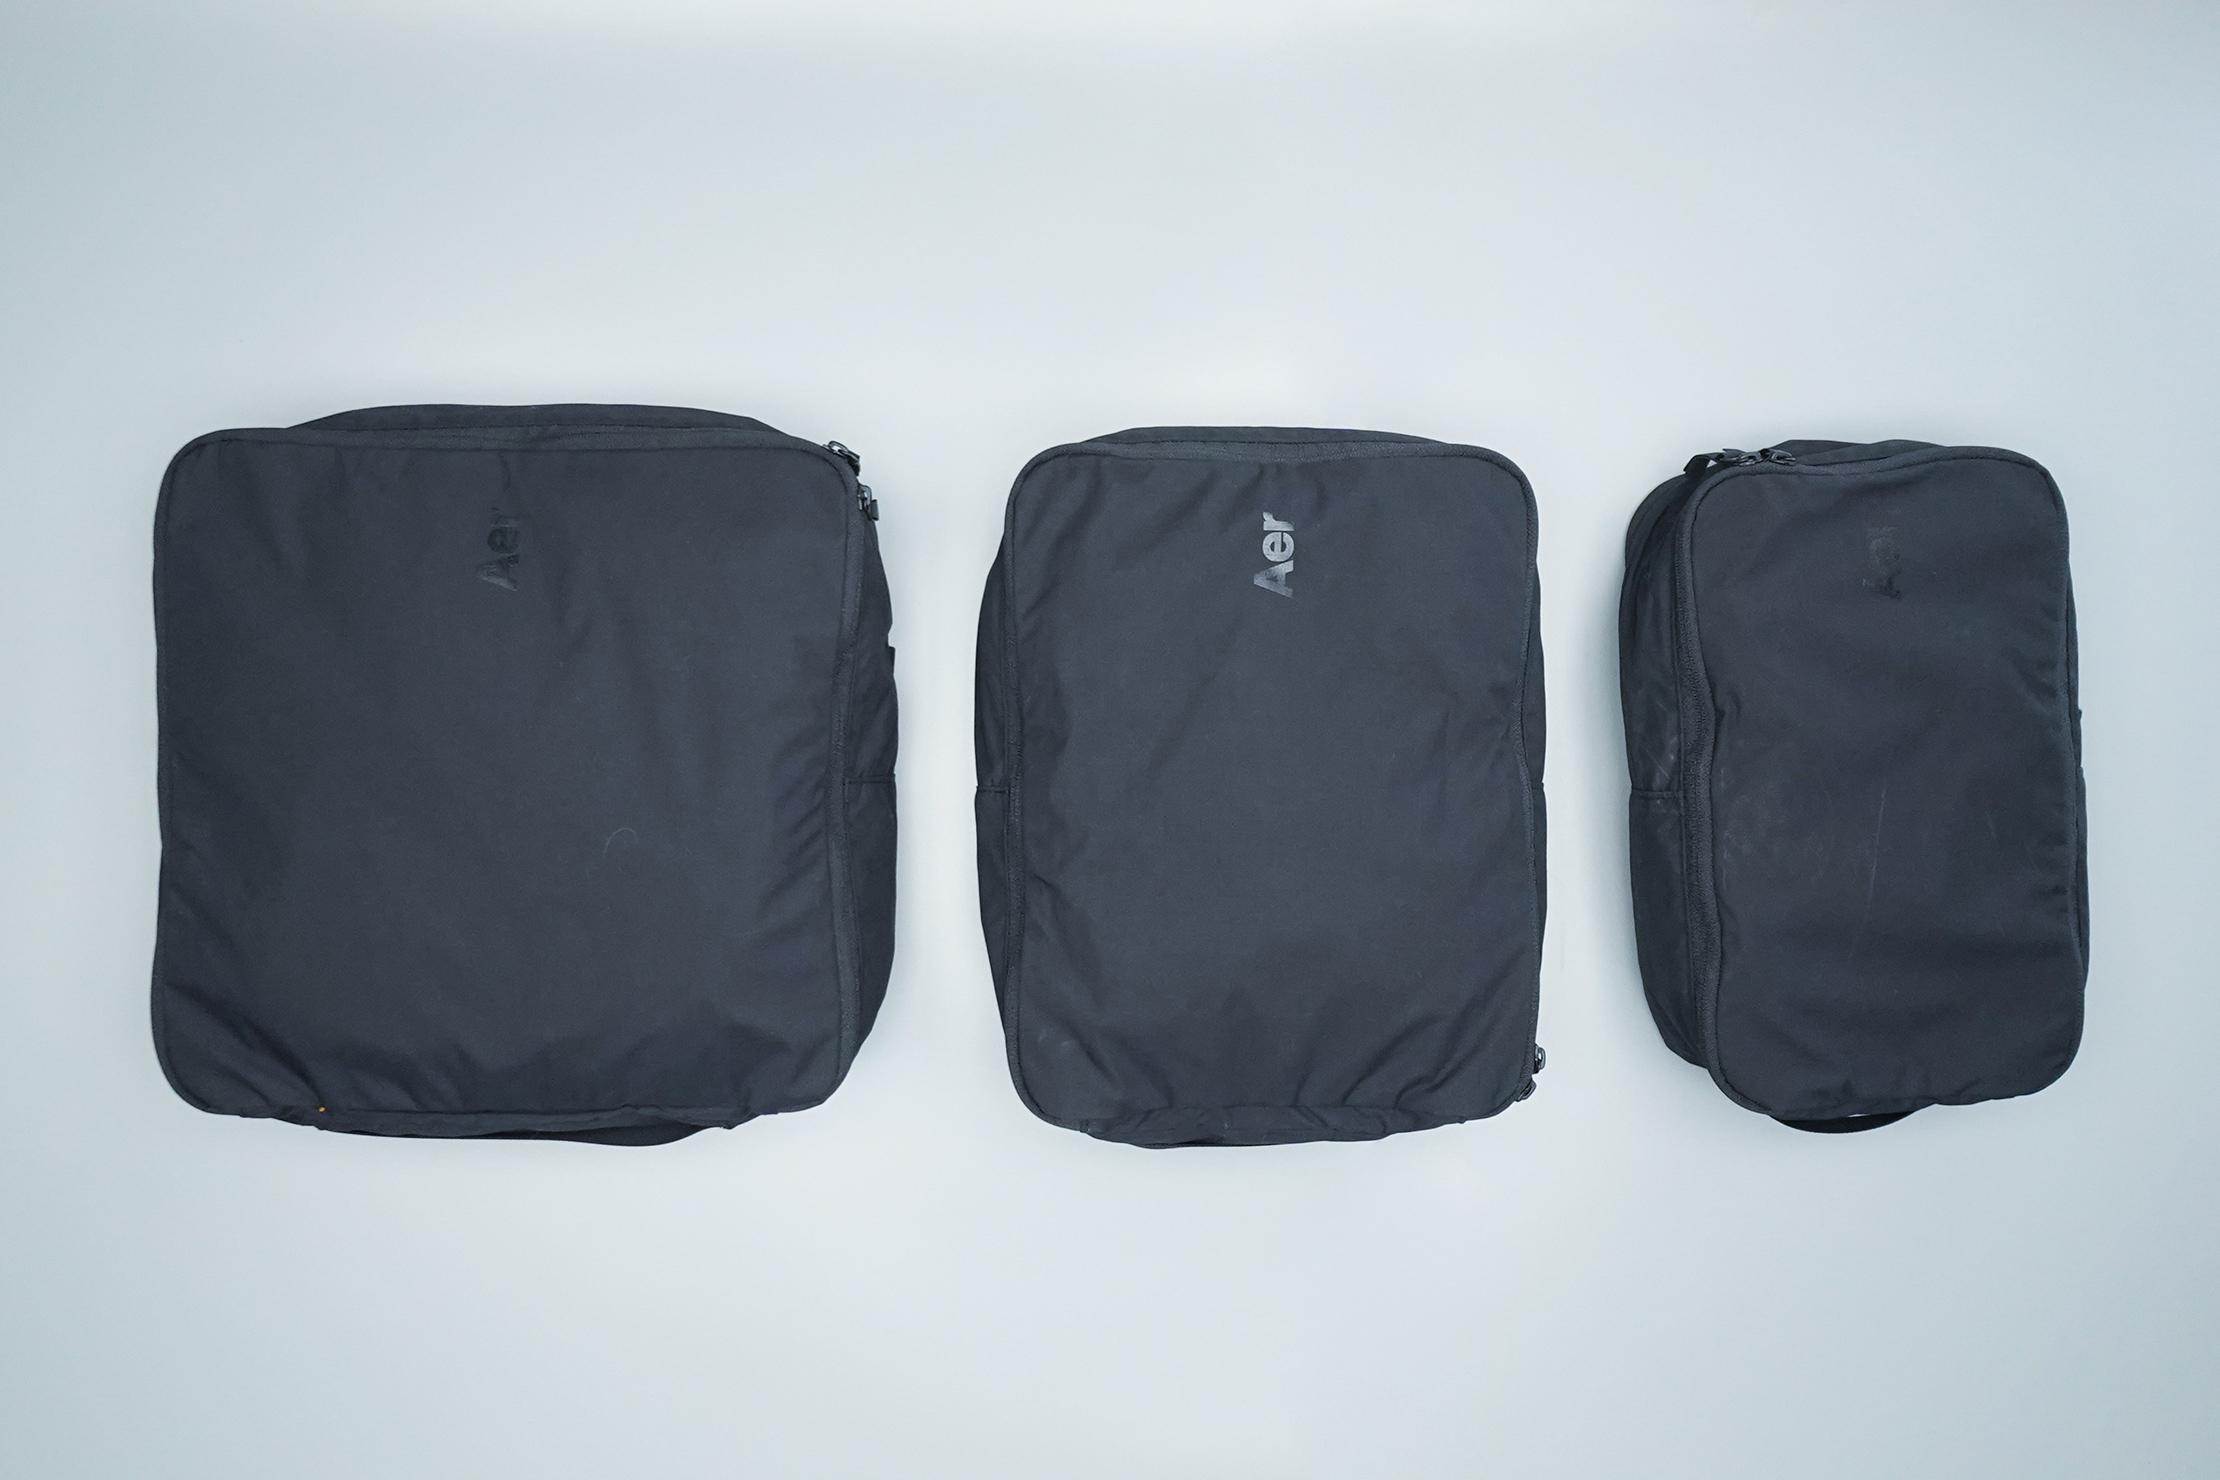 Aer Packing Cubes (V2) Sizes